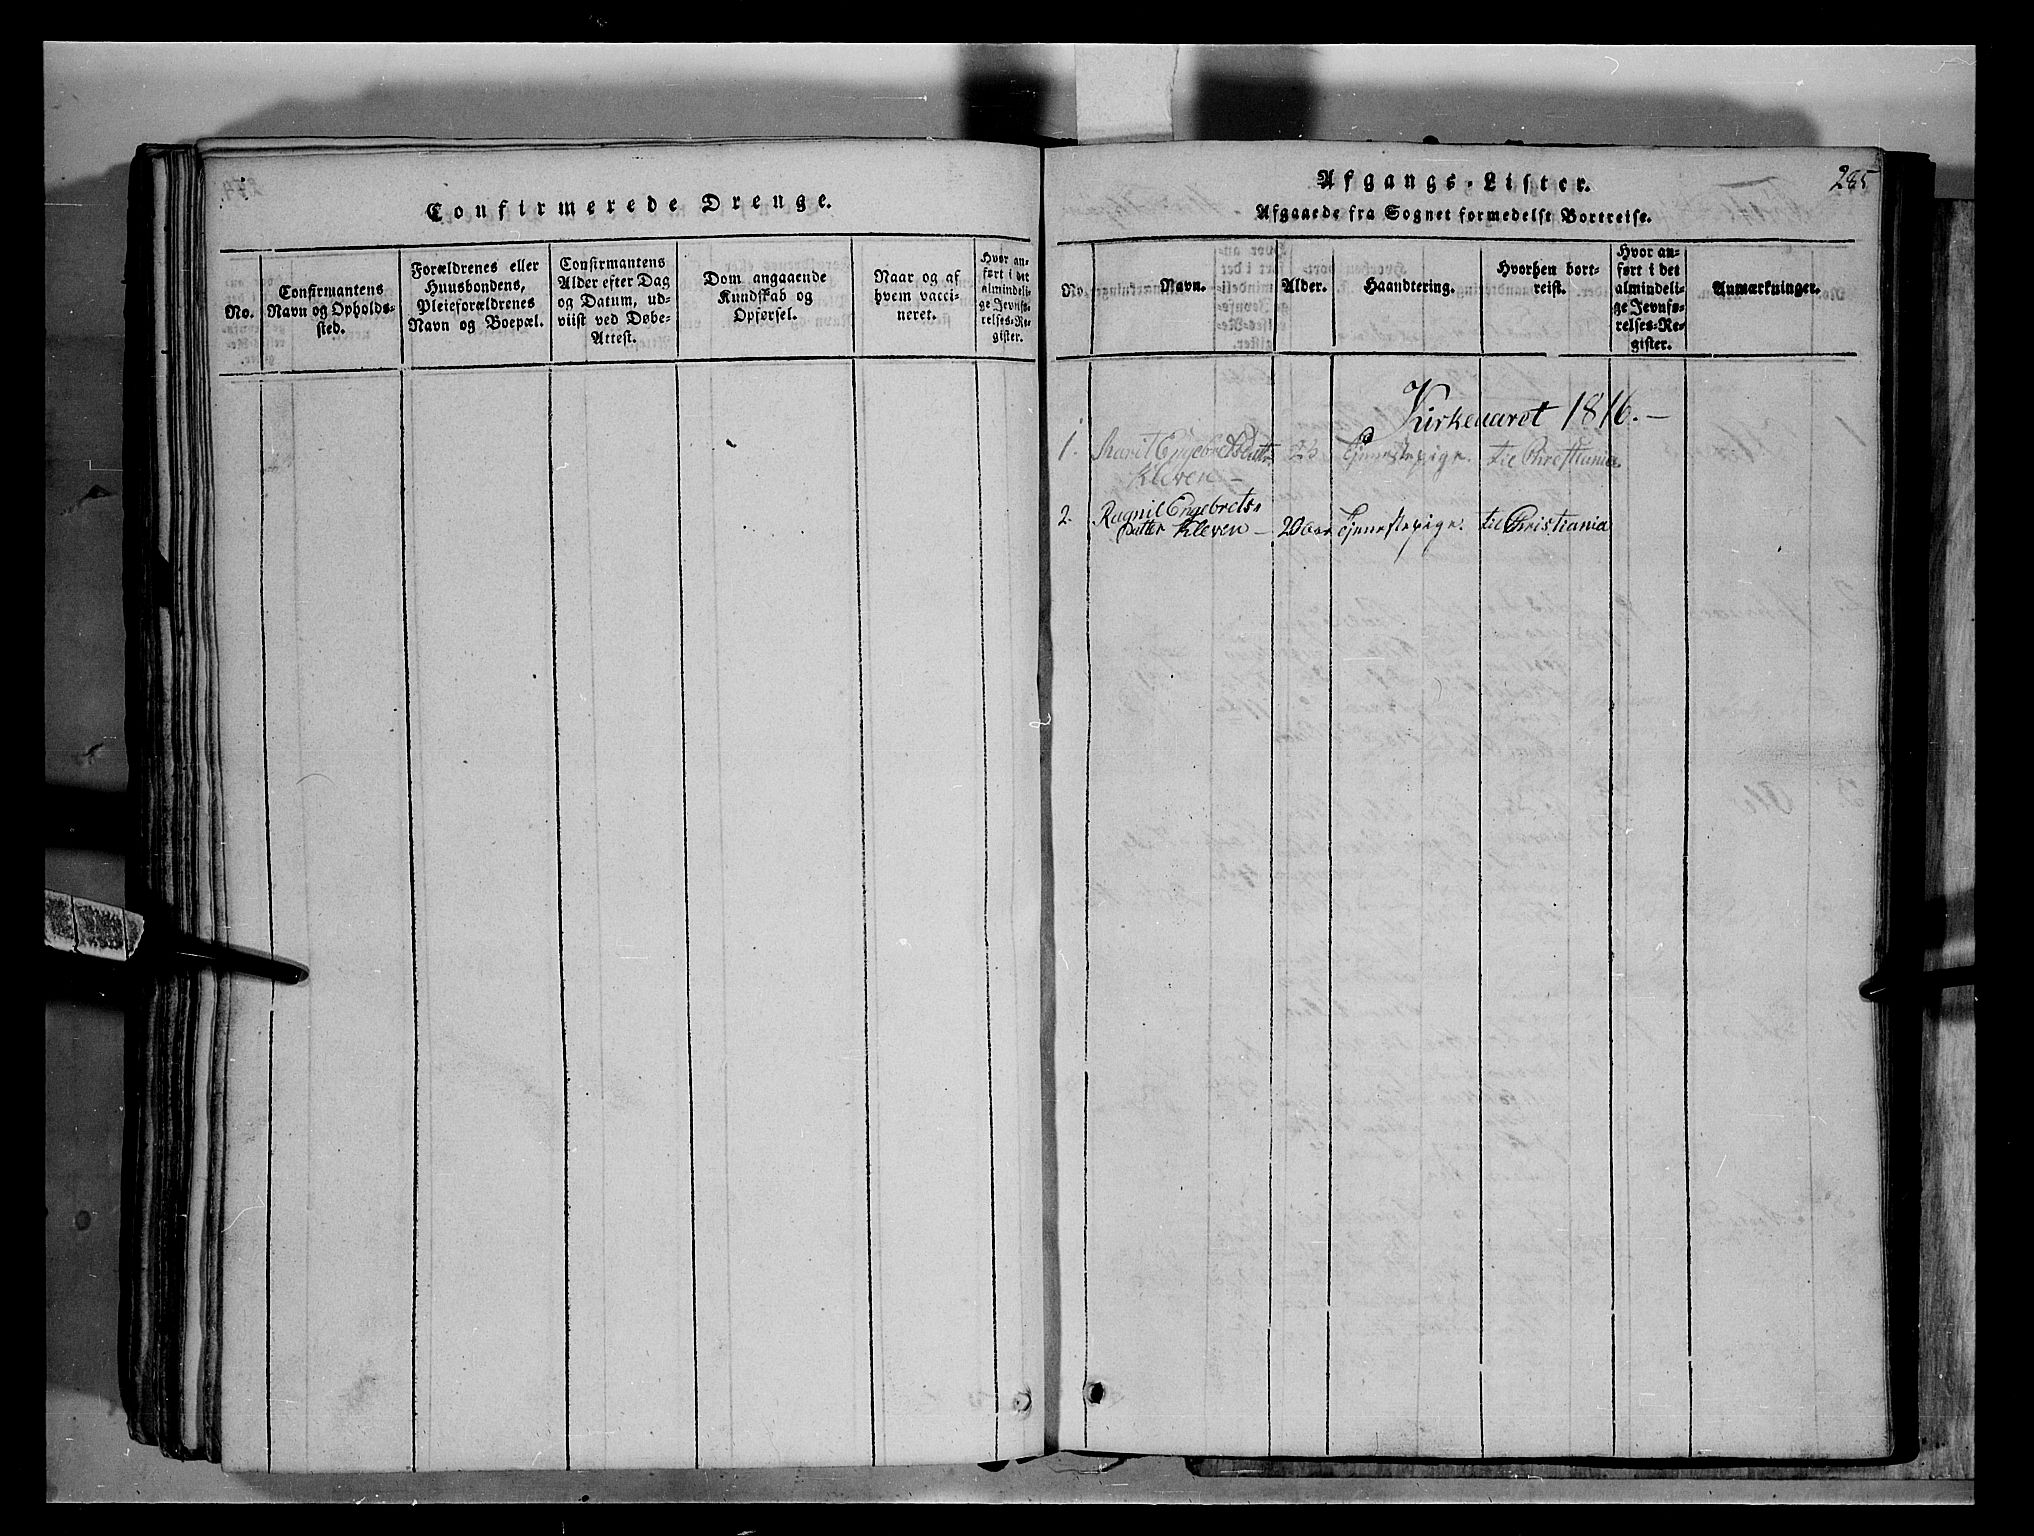 SAH, Fron prestekontor, H/Ha/Hab/L0004: Klokkerbok nr. 4, 1816-1850, s. 285